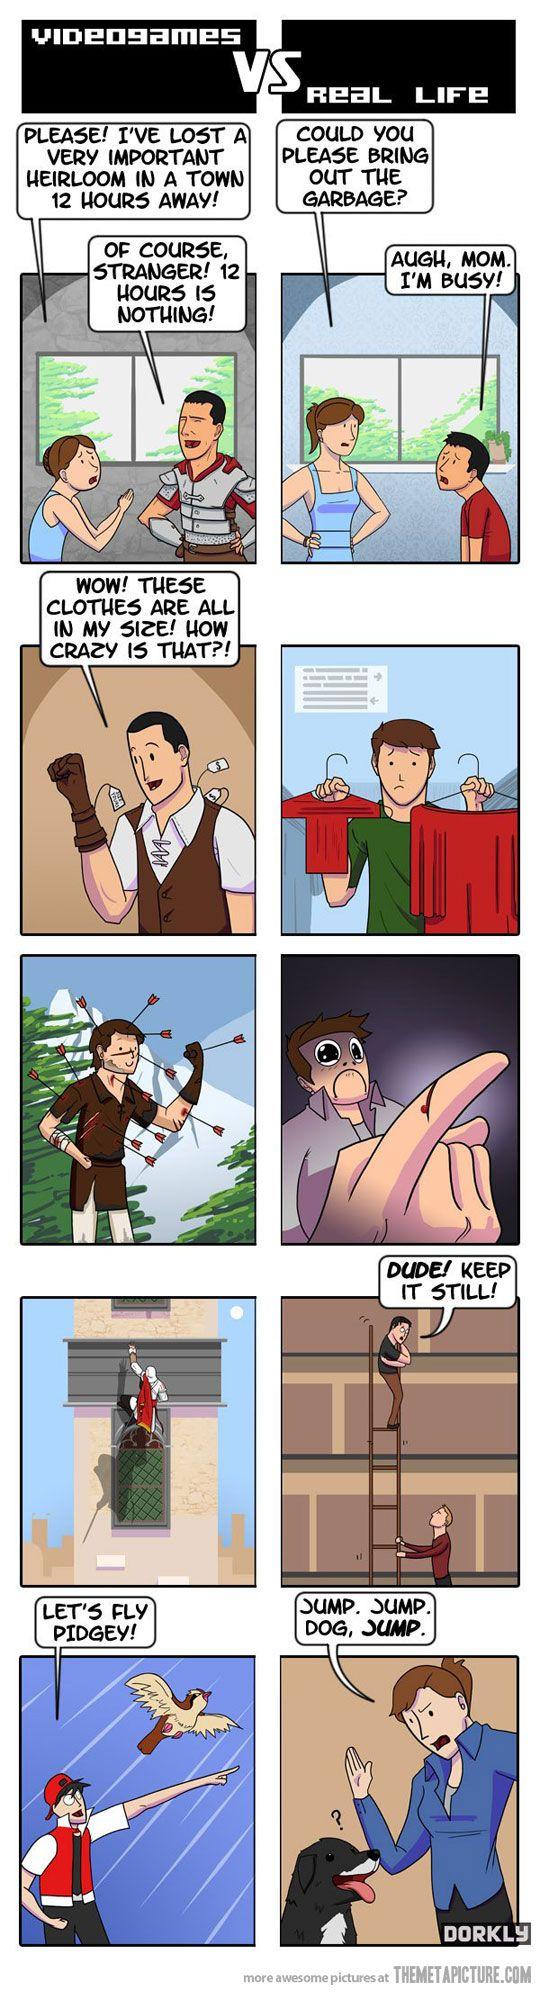 Videogames vs. Real Life